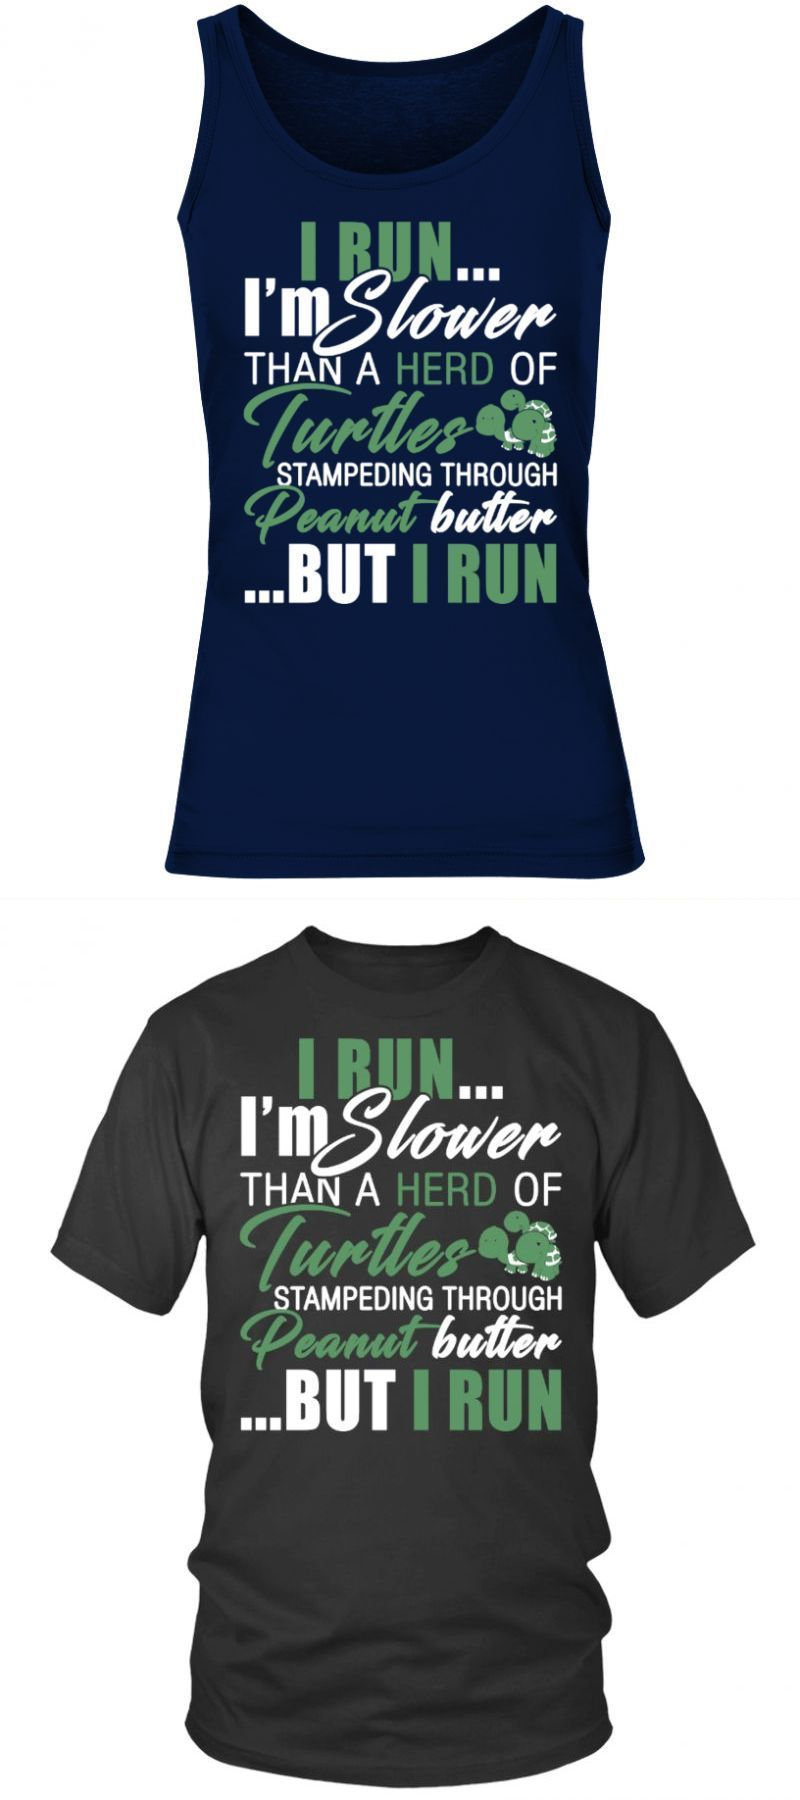 I hate running t shirt nike i m slower but i run custom running t-shirt  printing  hate  running  shirt  nike  i m  slower  but  run  custom  t-shirt  ... be62cbe904d8